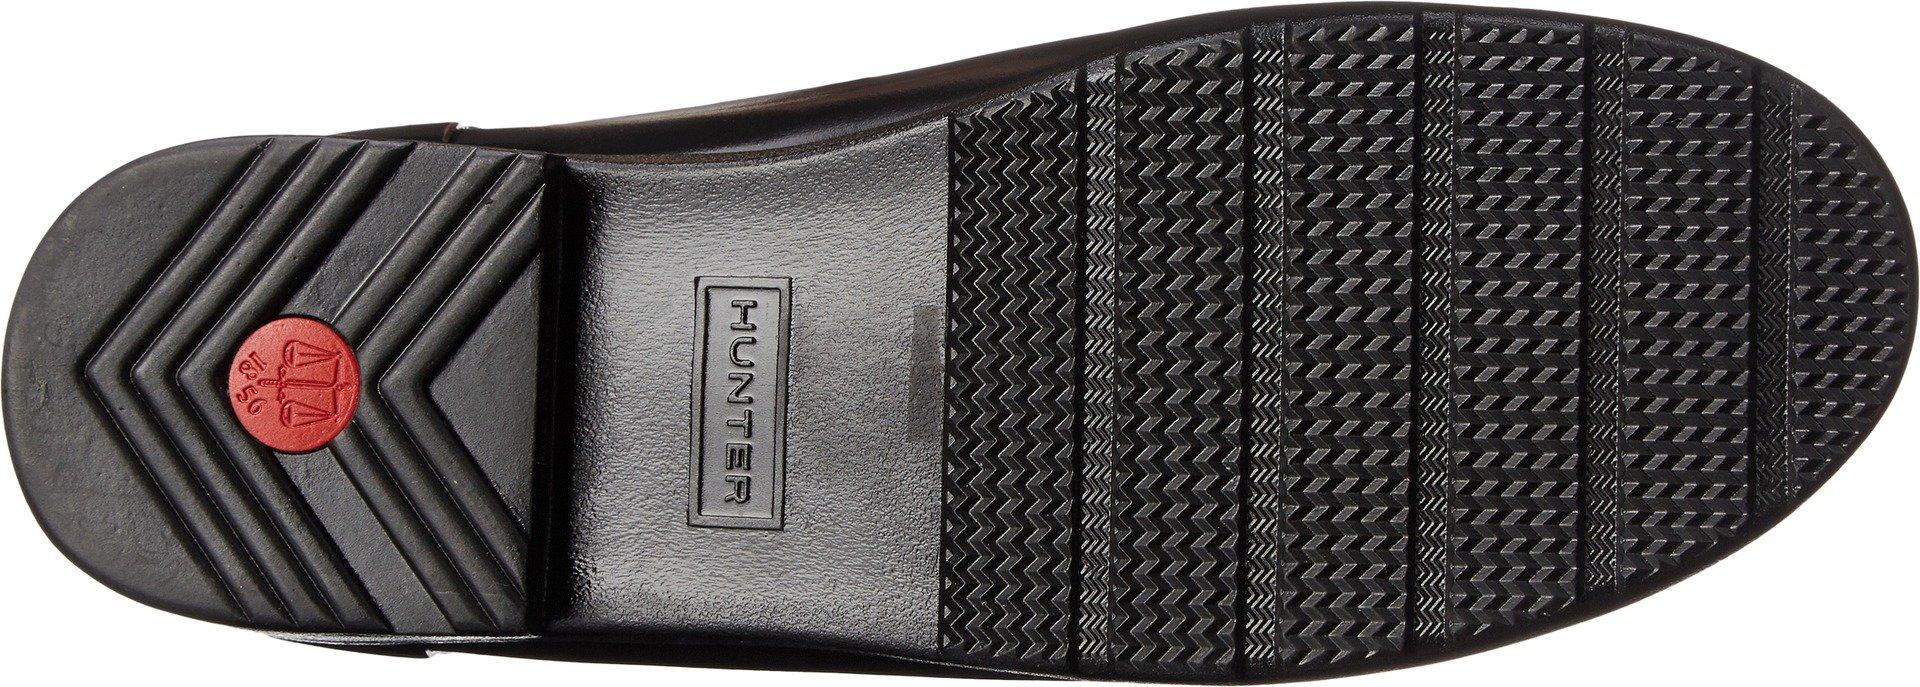 Hunter Boots Women's Original Refined Gloss Boots, Black, 5 B(M) US